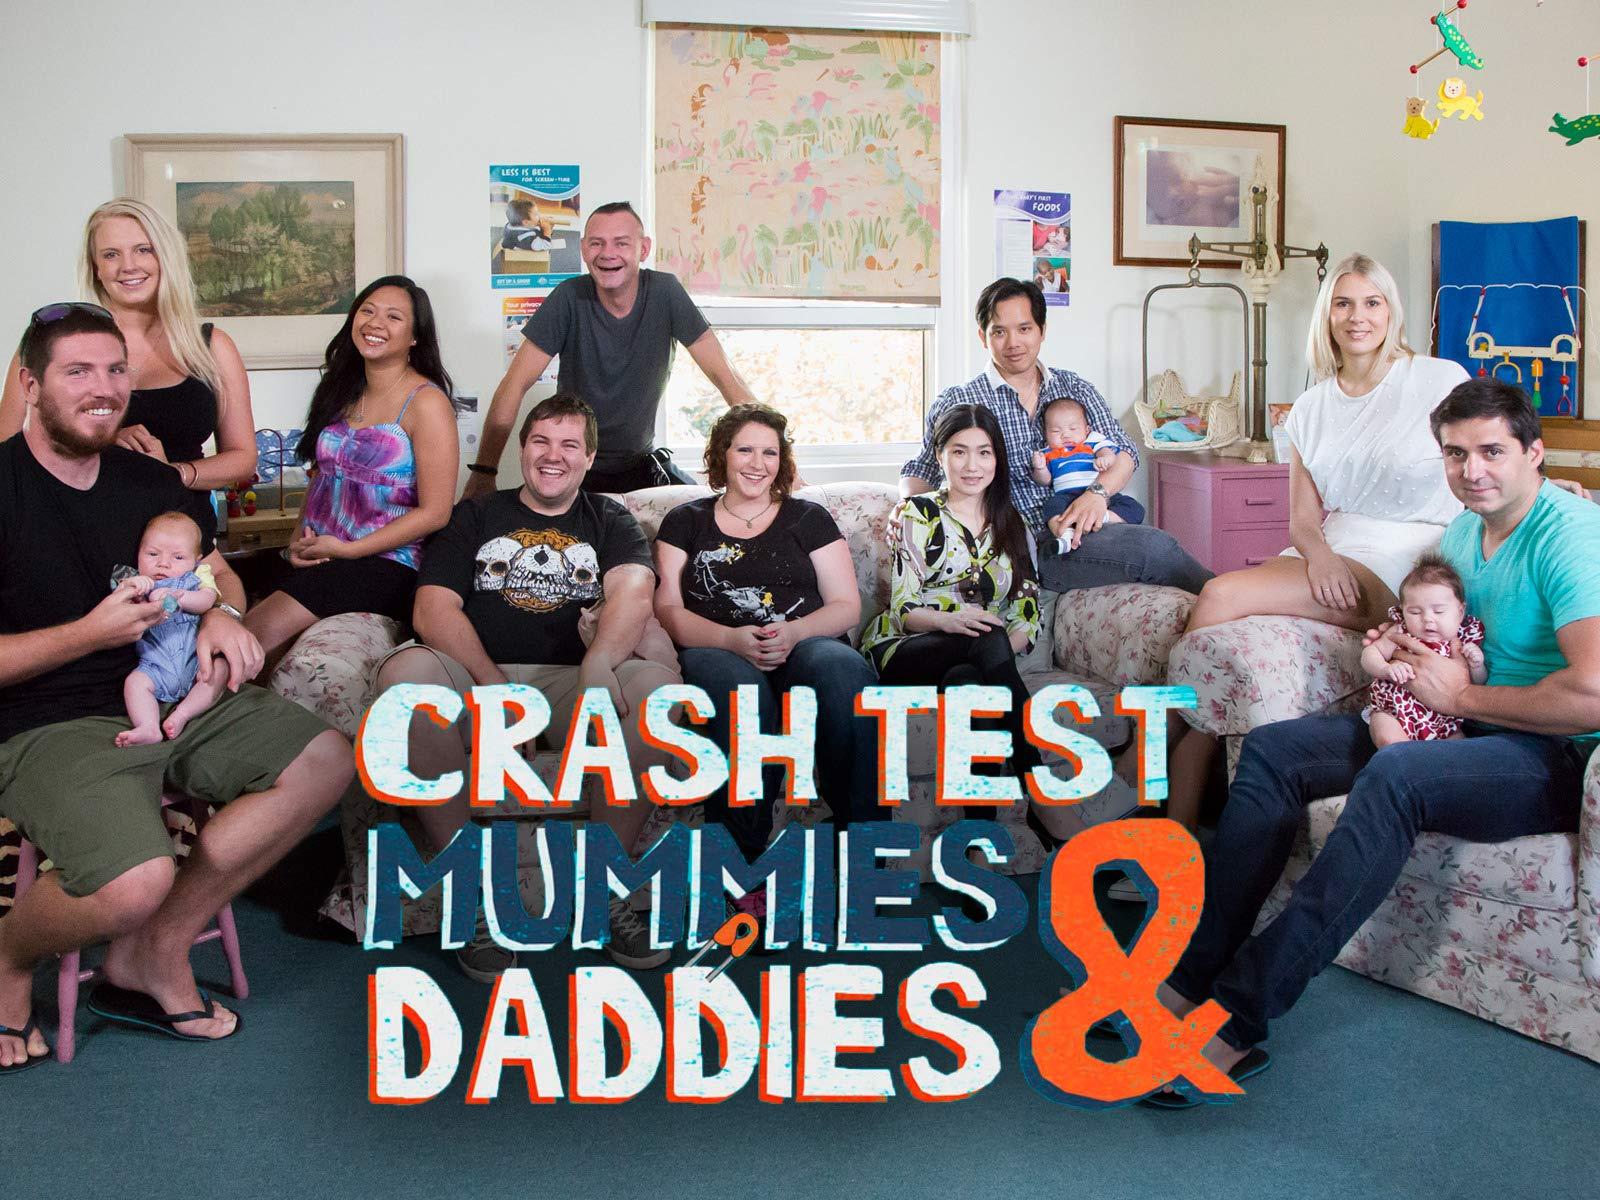 Crash Test Mummies And Daddies - Season 1